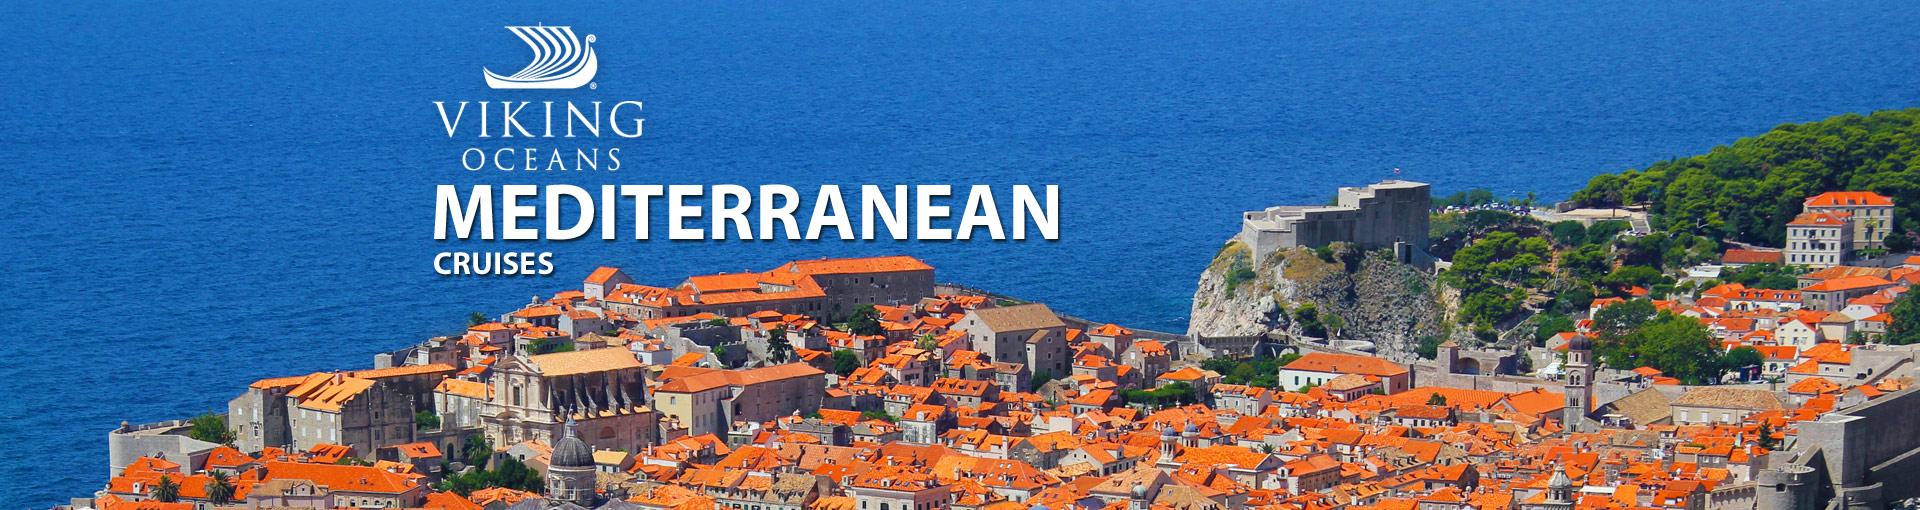 Viking Oceans Mediterranean Cruises